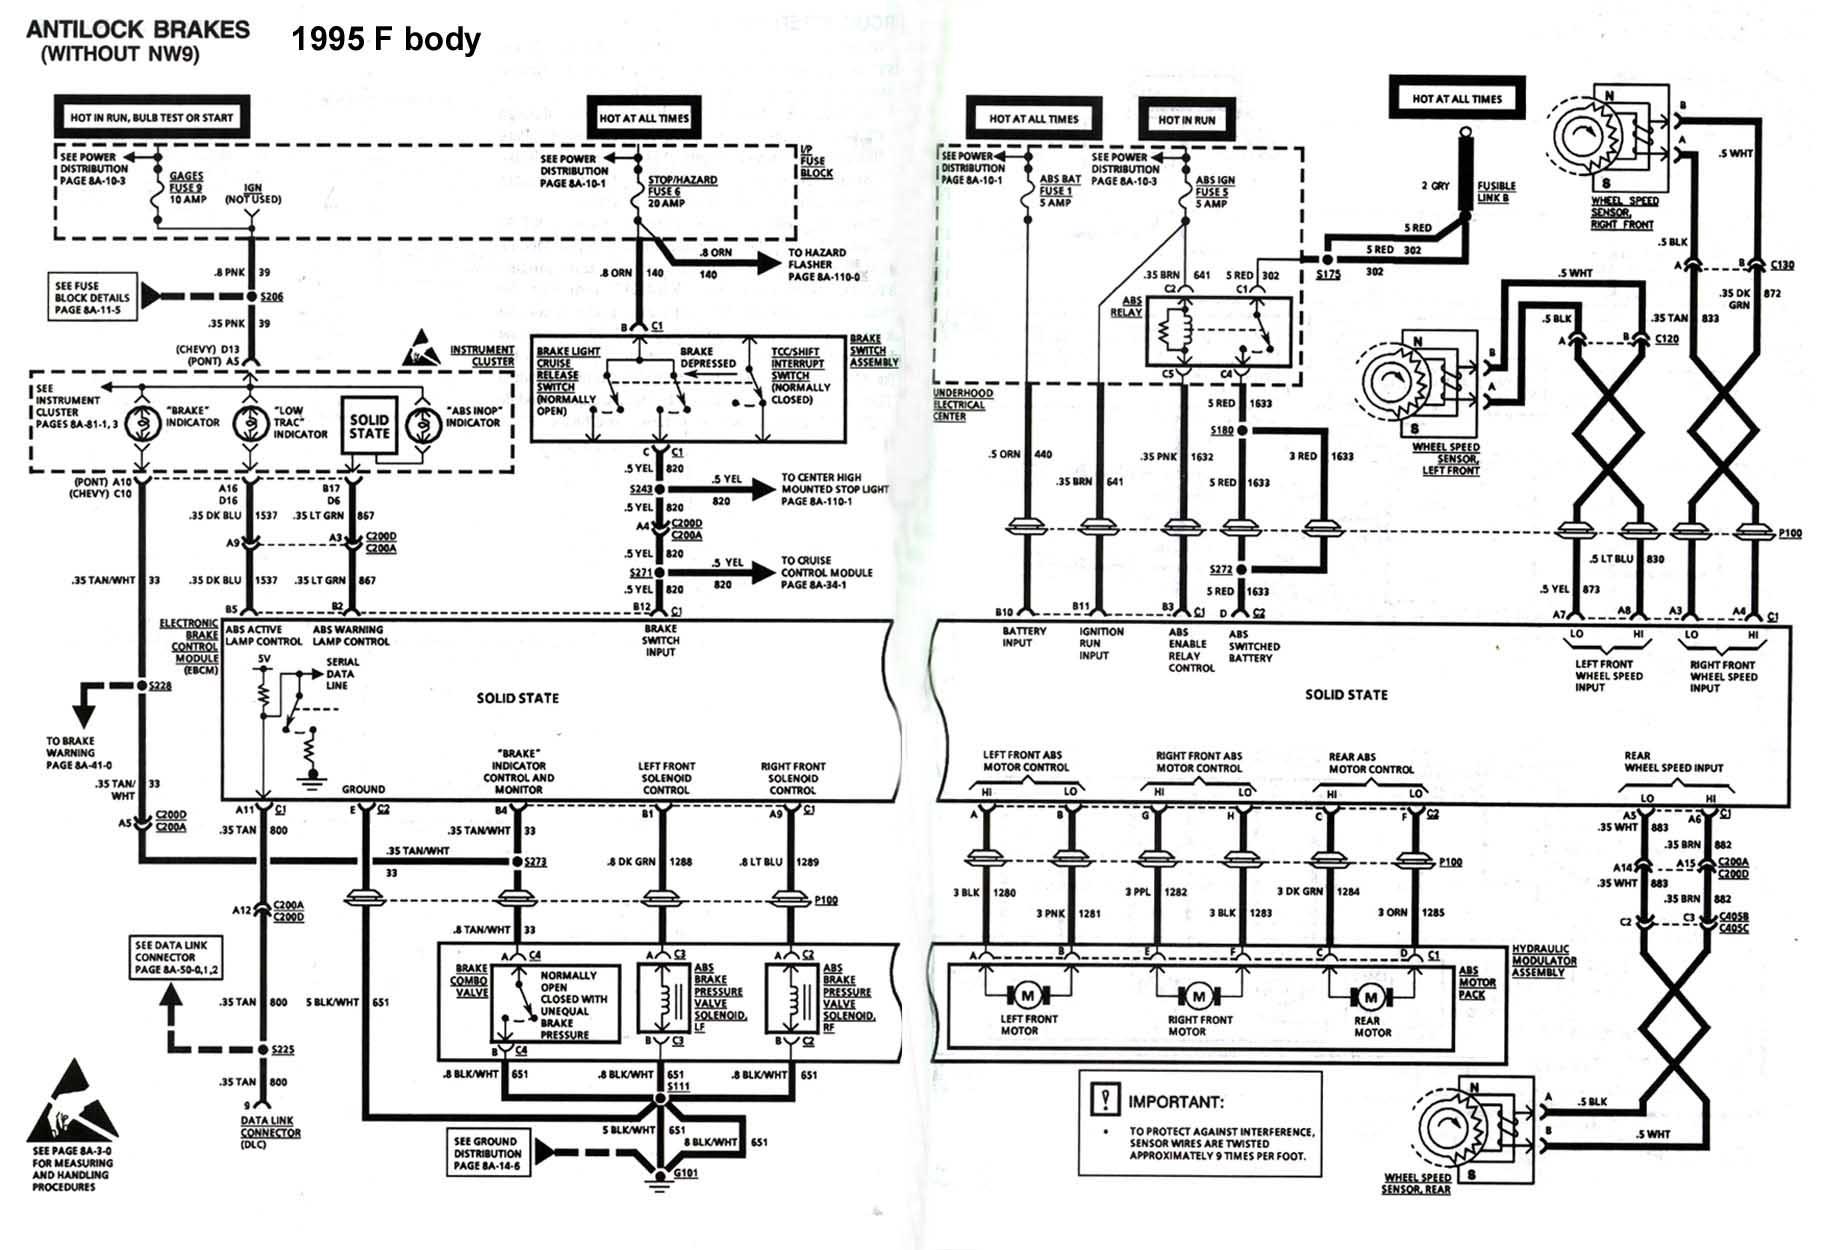 2000 grand prix window wiring diagram